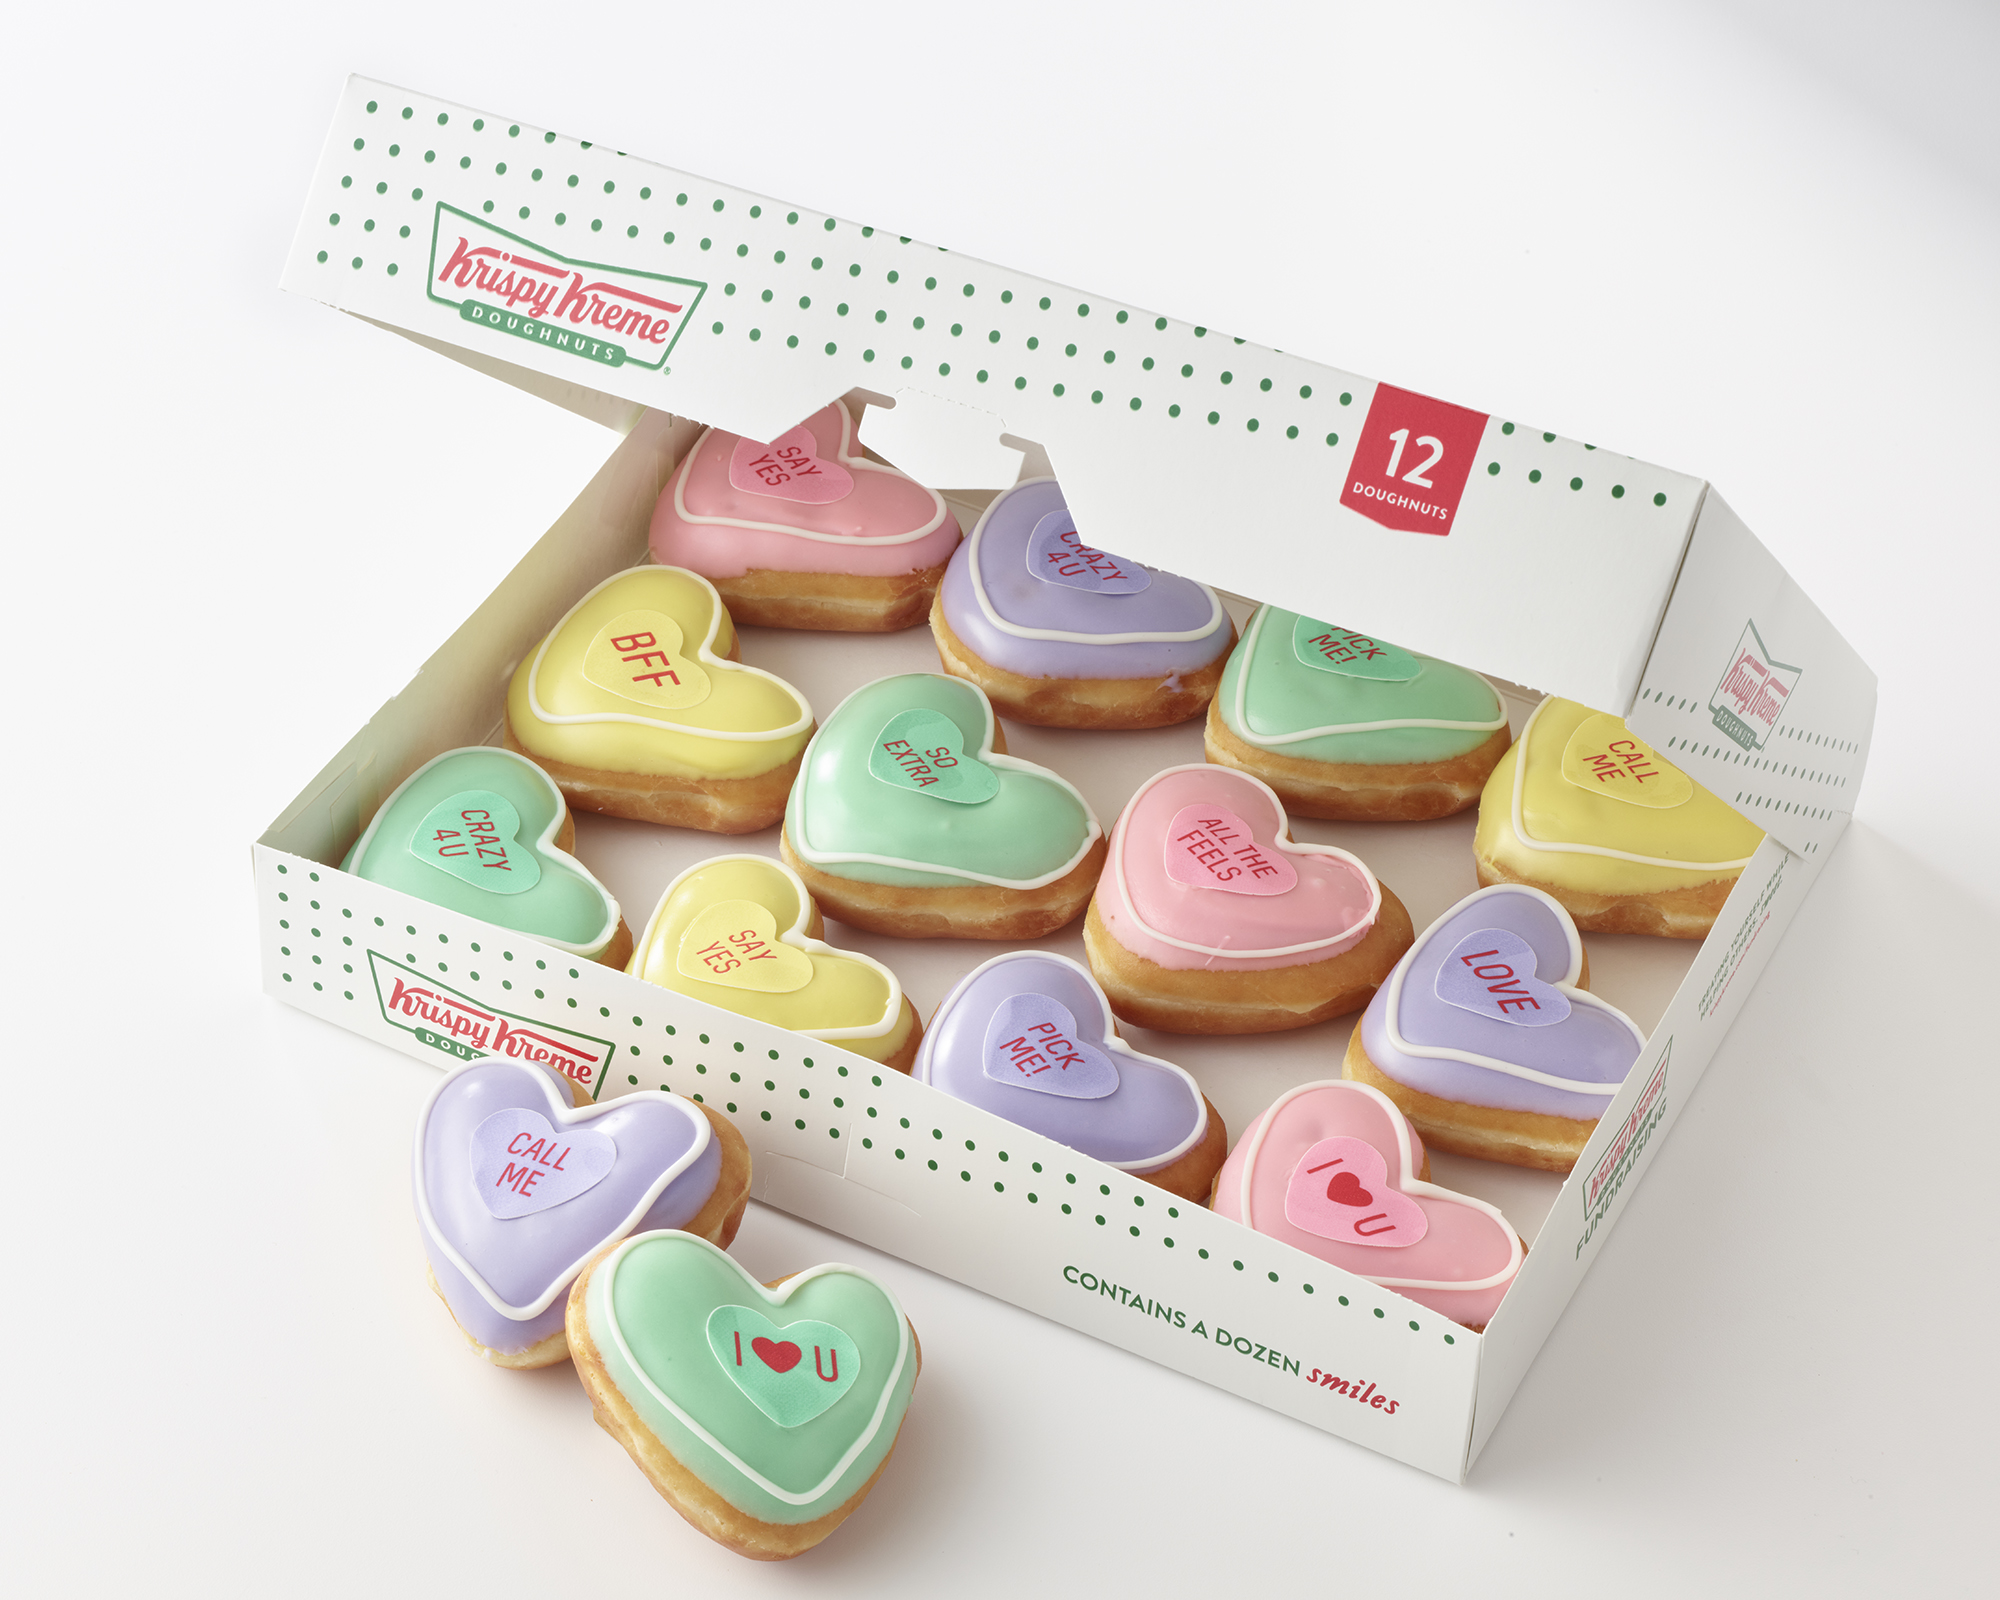 Krispy Kreme's Newest Doughnuts Are Giant Conversation Hearts, Basically